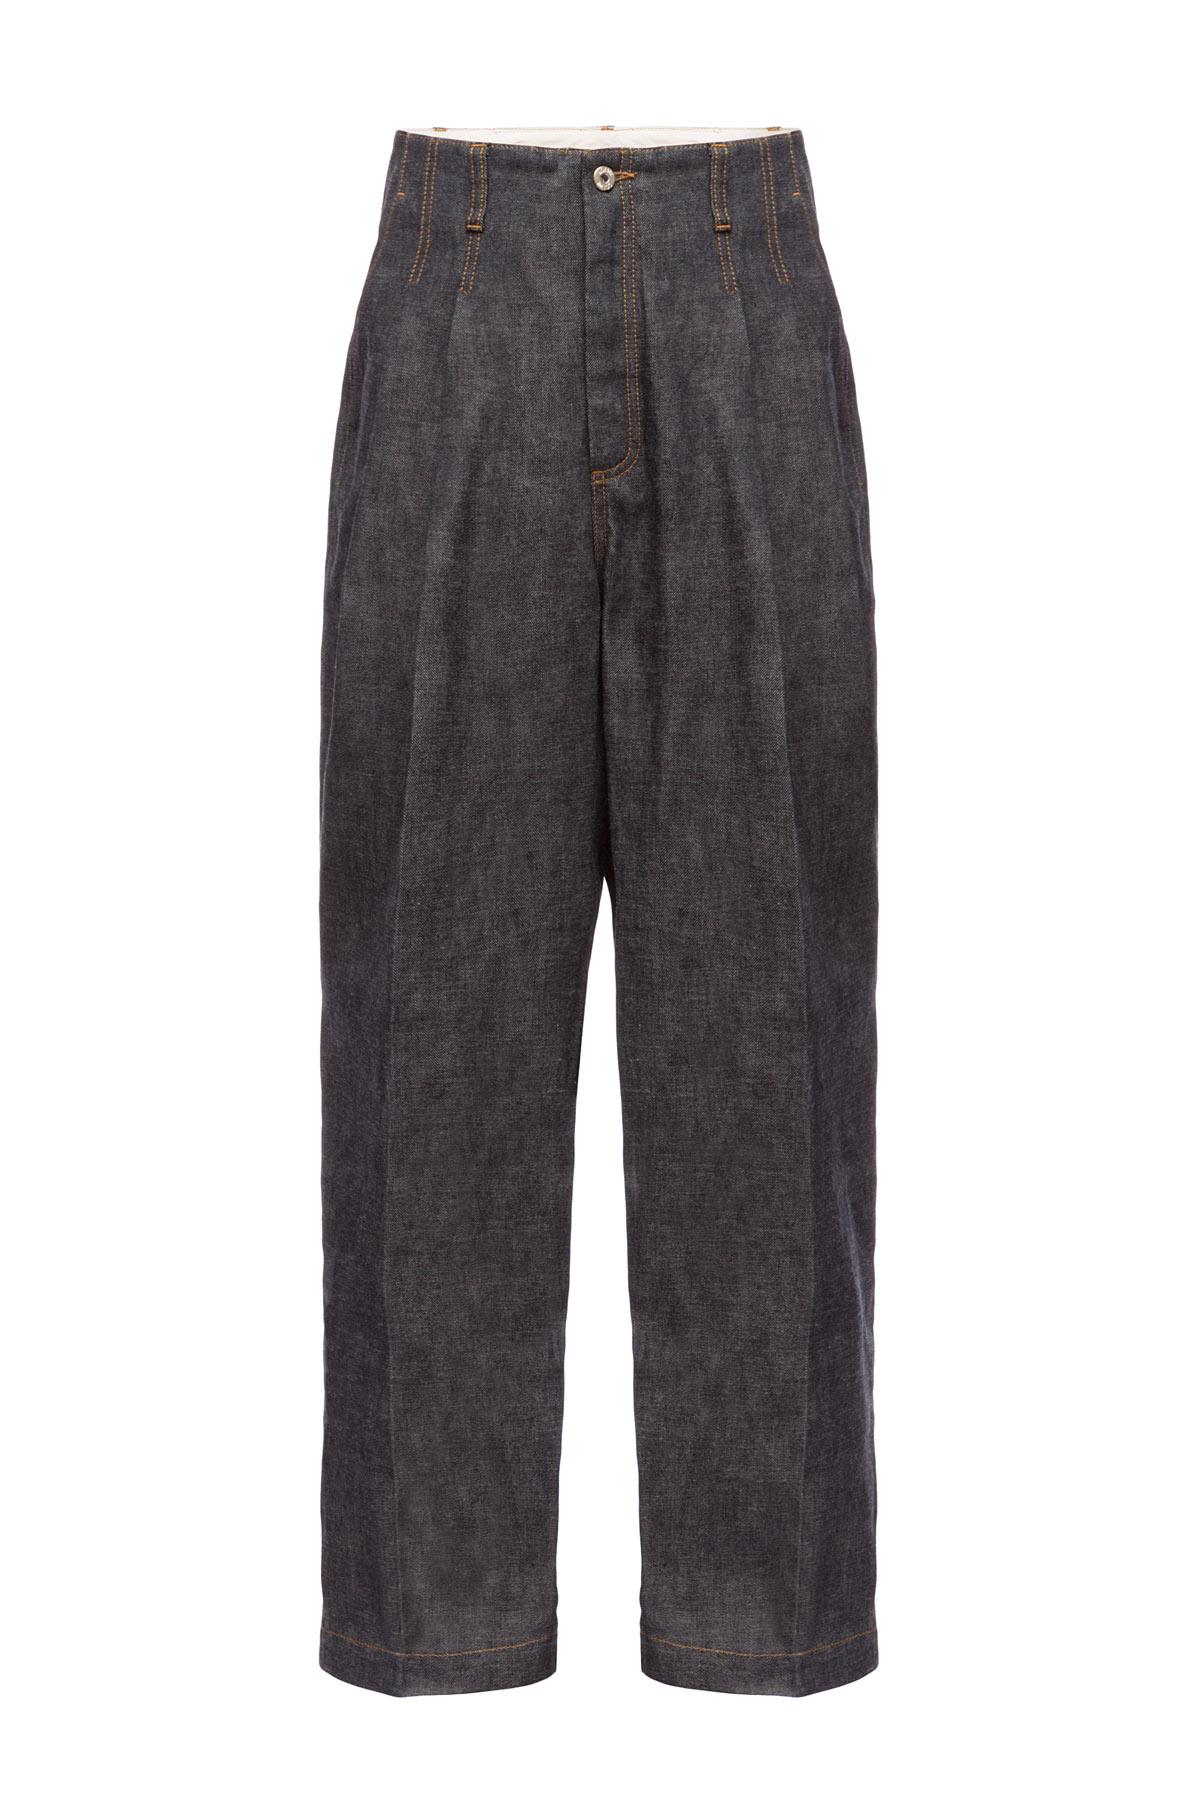 LOEWE Denim Trousers Botanical Navy Blue front